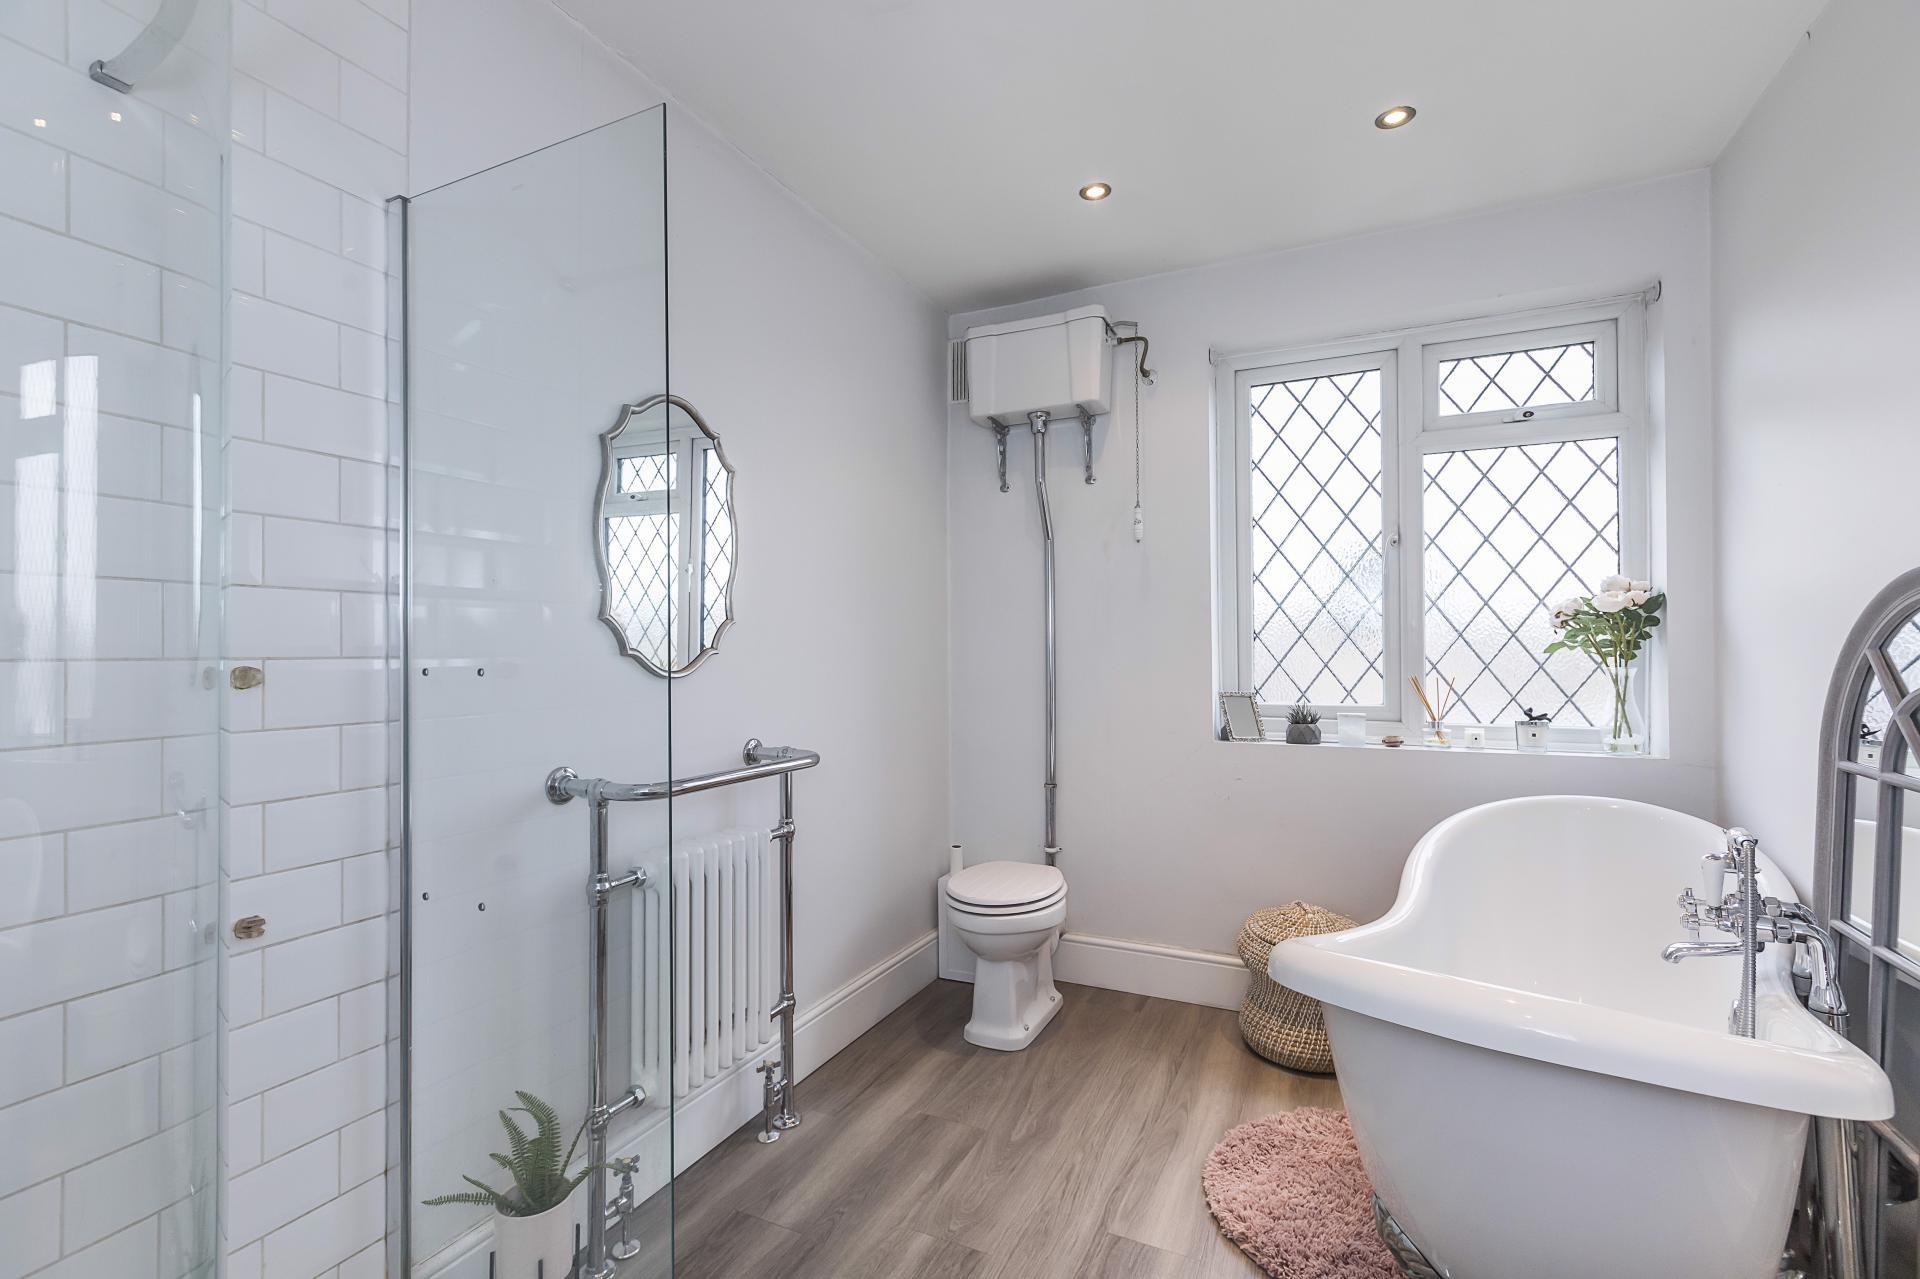 Tudor house simple bathroom renovation oak flooring metro tiles